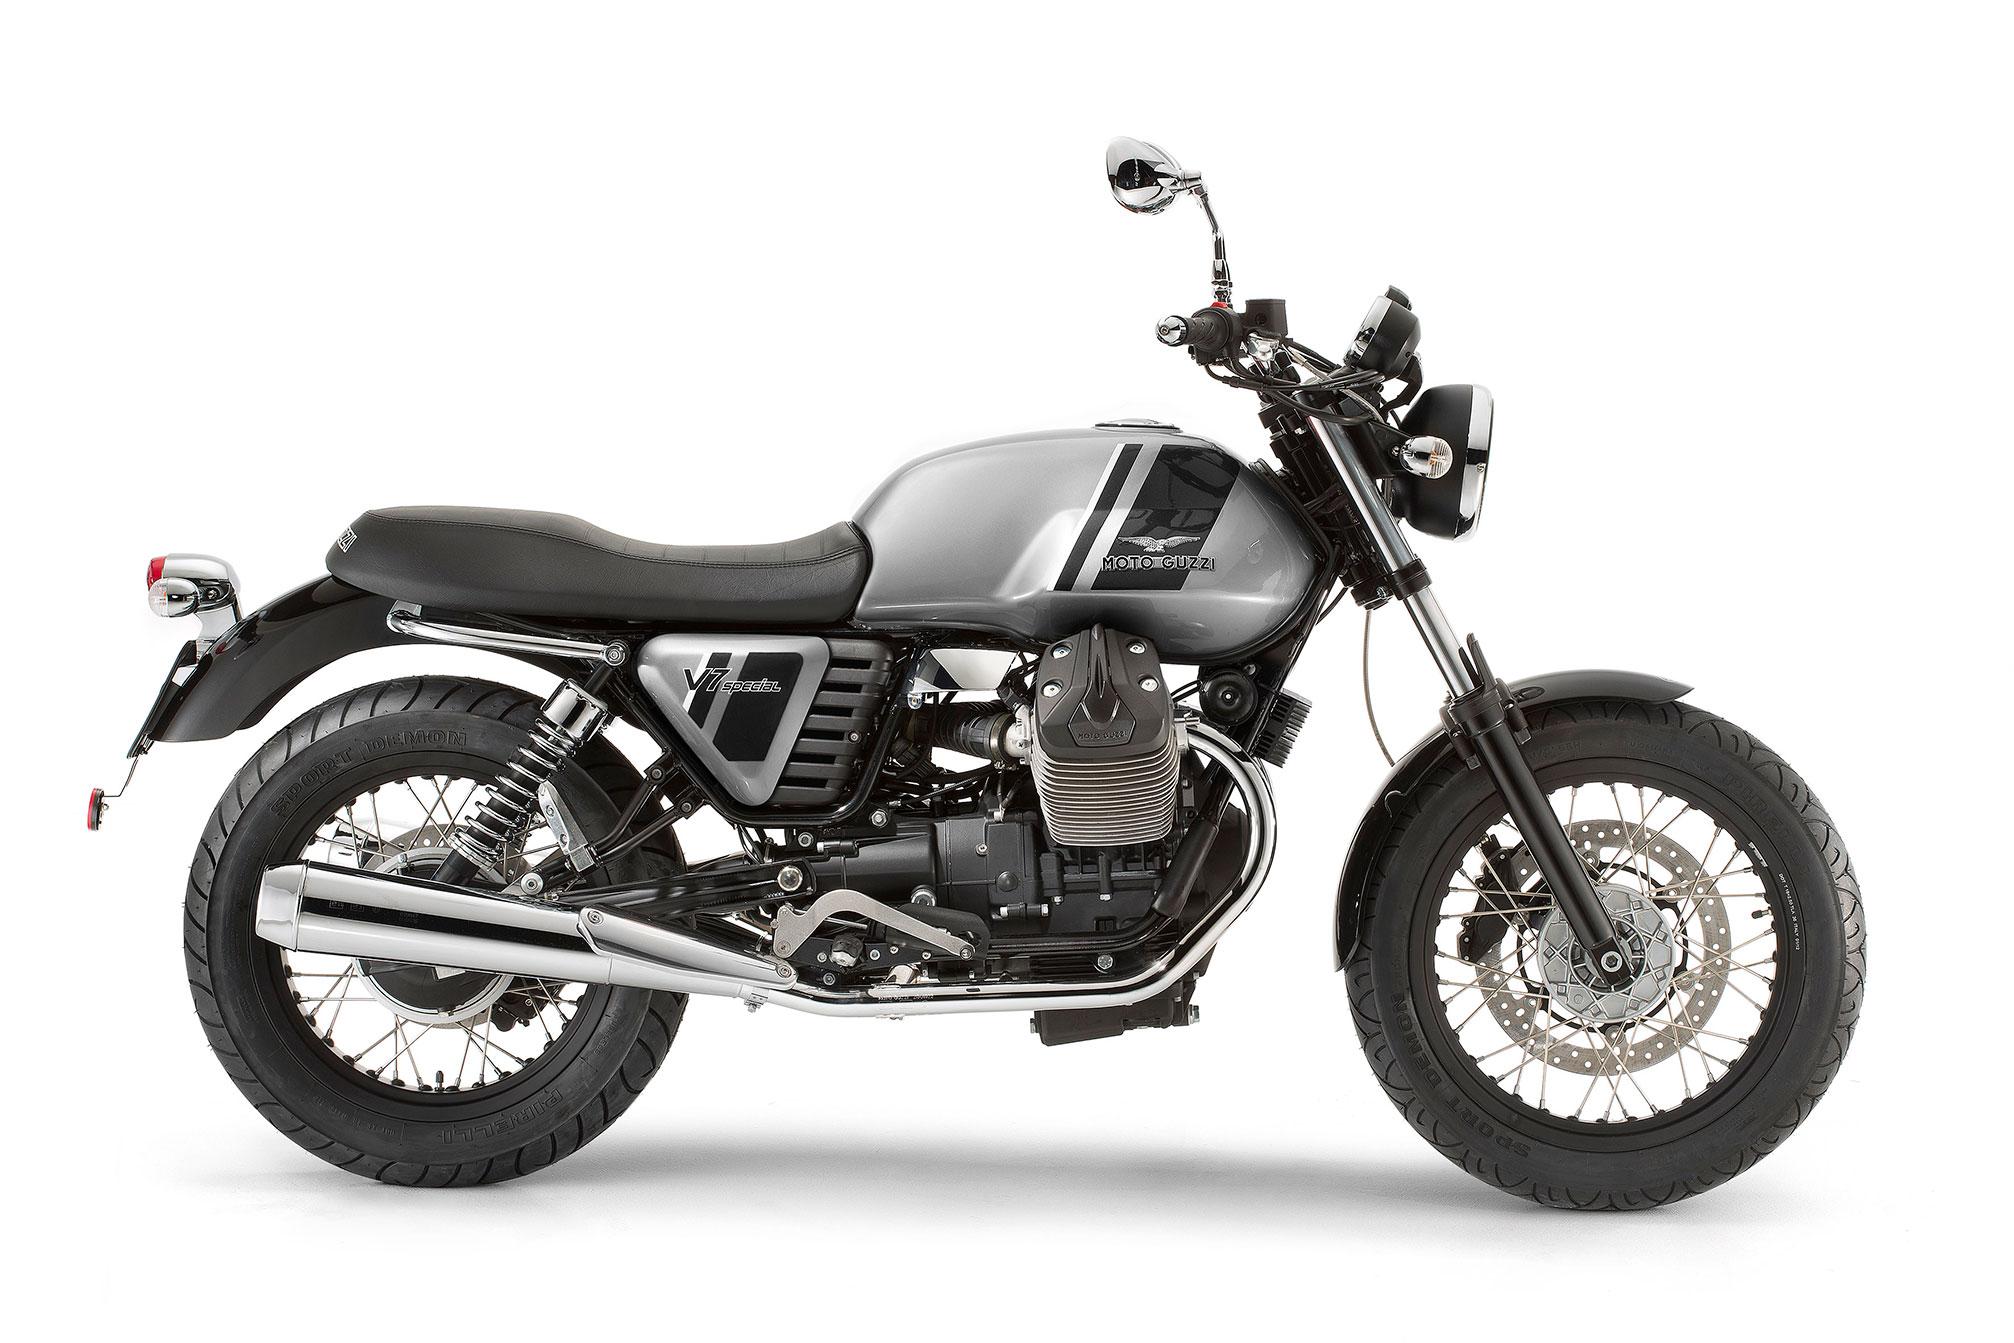 moto guzzi v7 racer specs 2013 2014 autoevolution. Black Bedroom Furniture Sets. Home Design Ideas